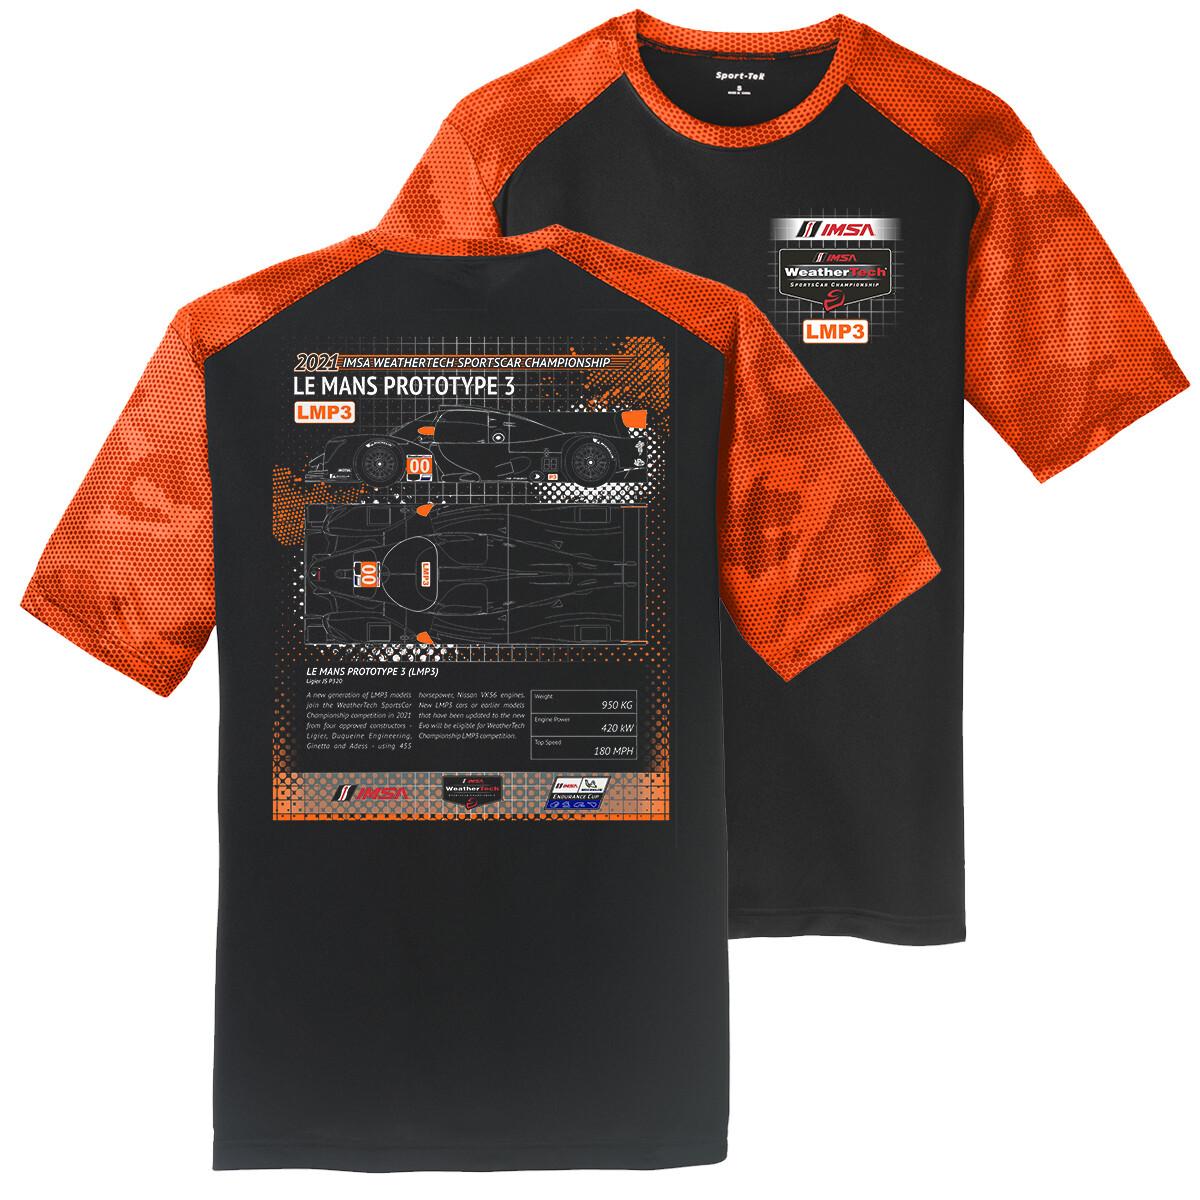 LMP3 Tech T-Black/Orange